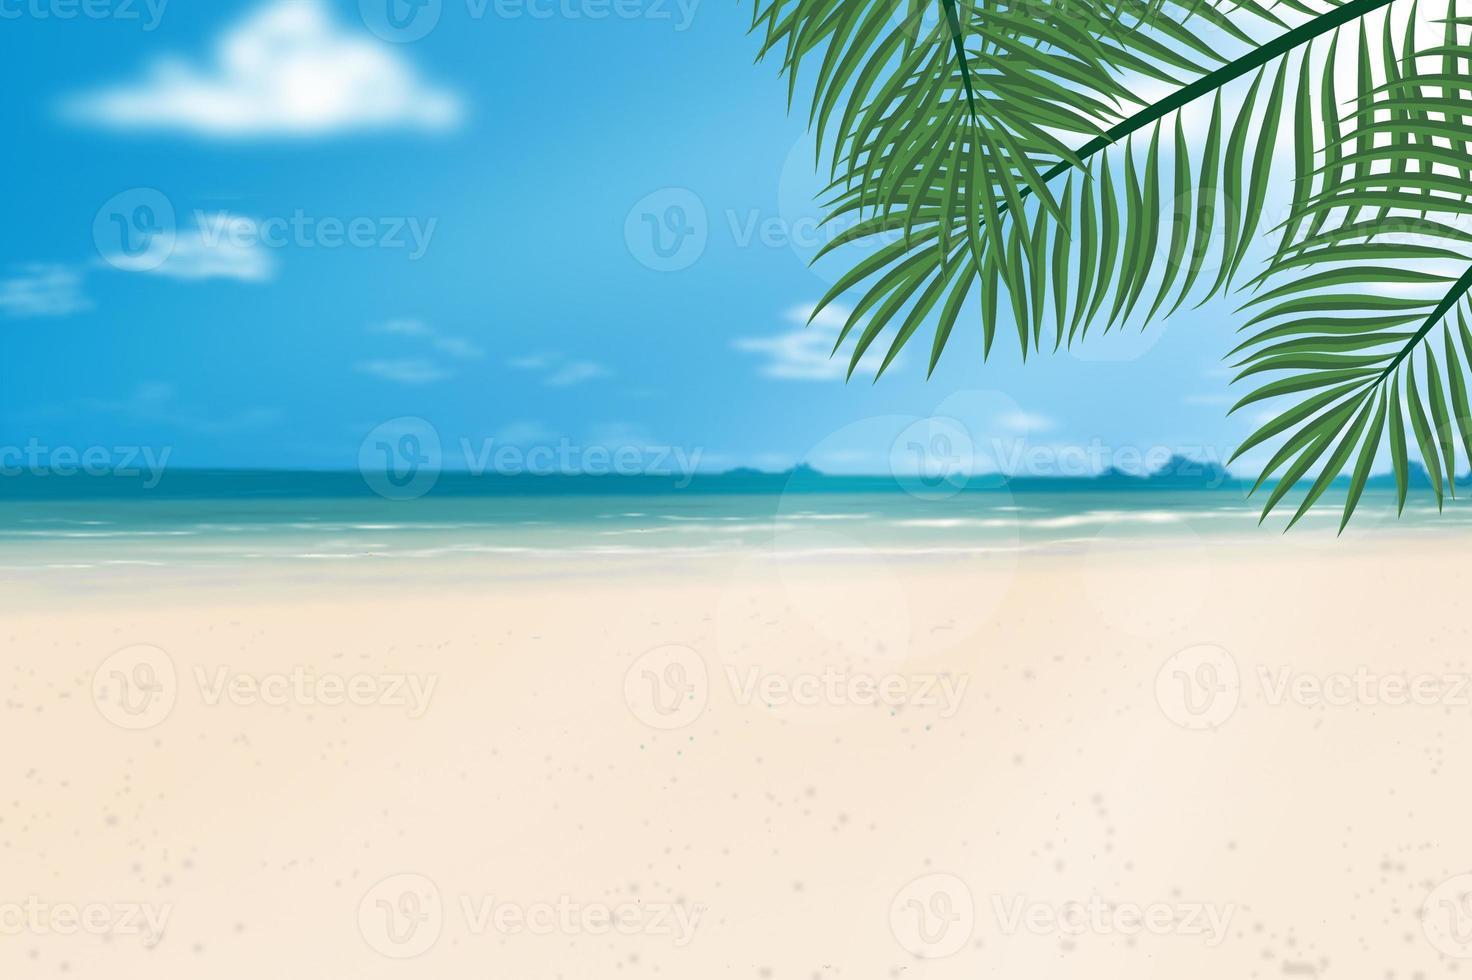 spiaggia di sabbia in estate. foto